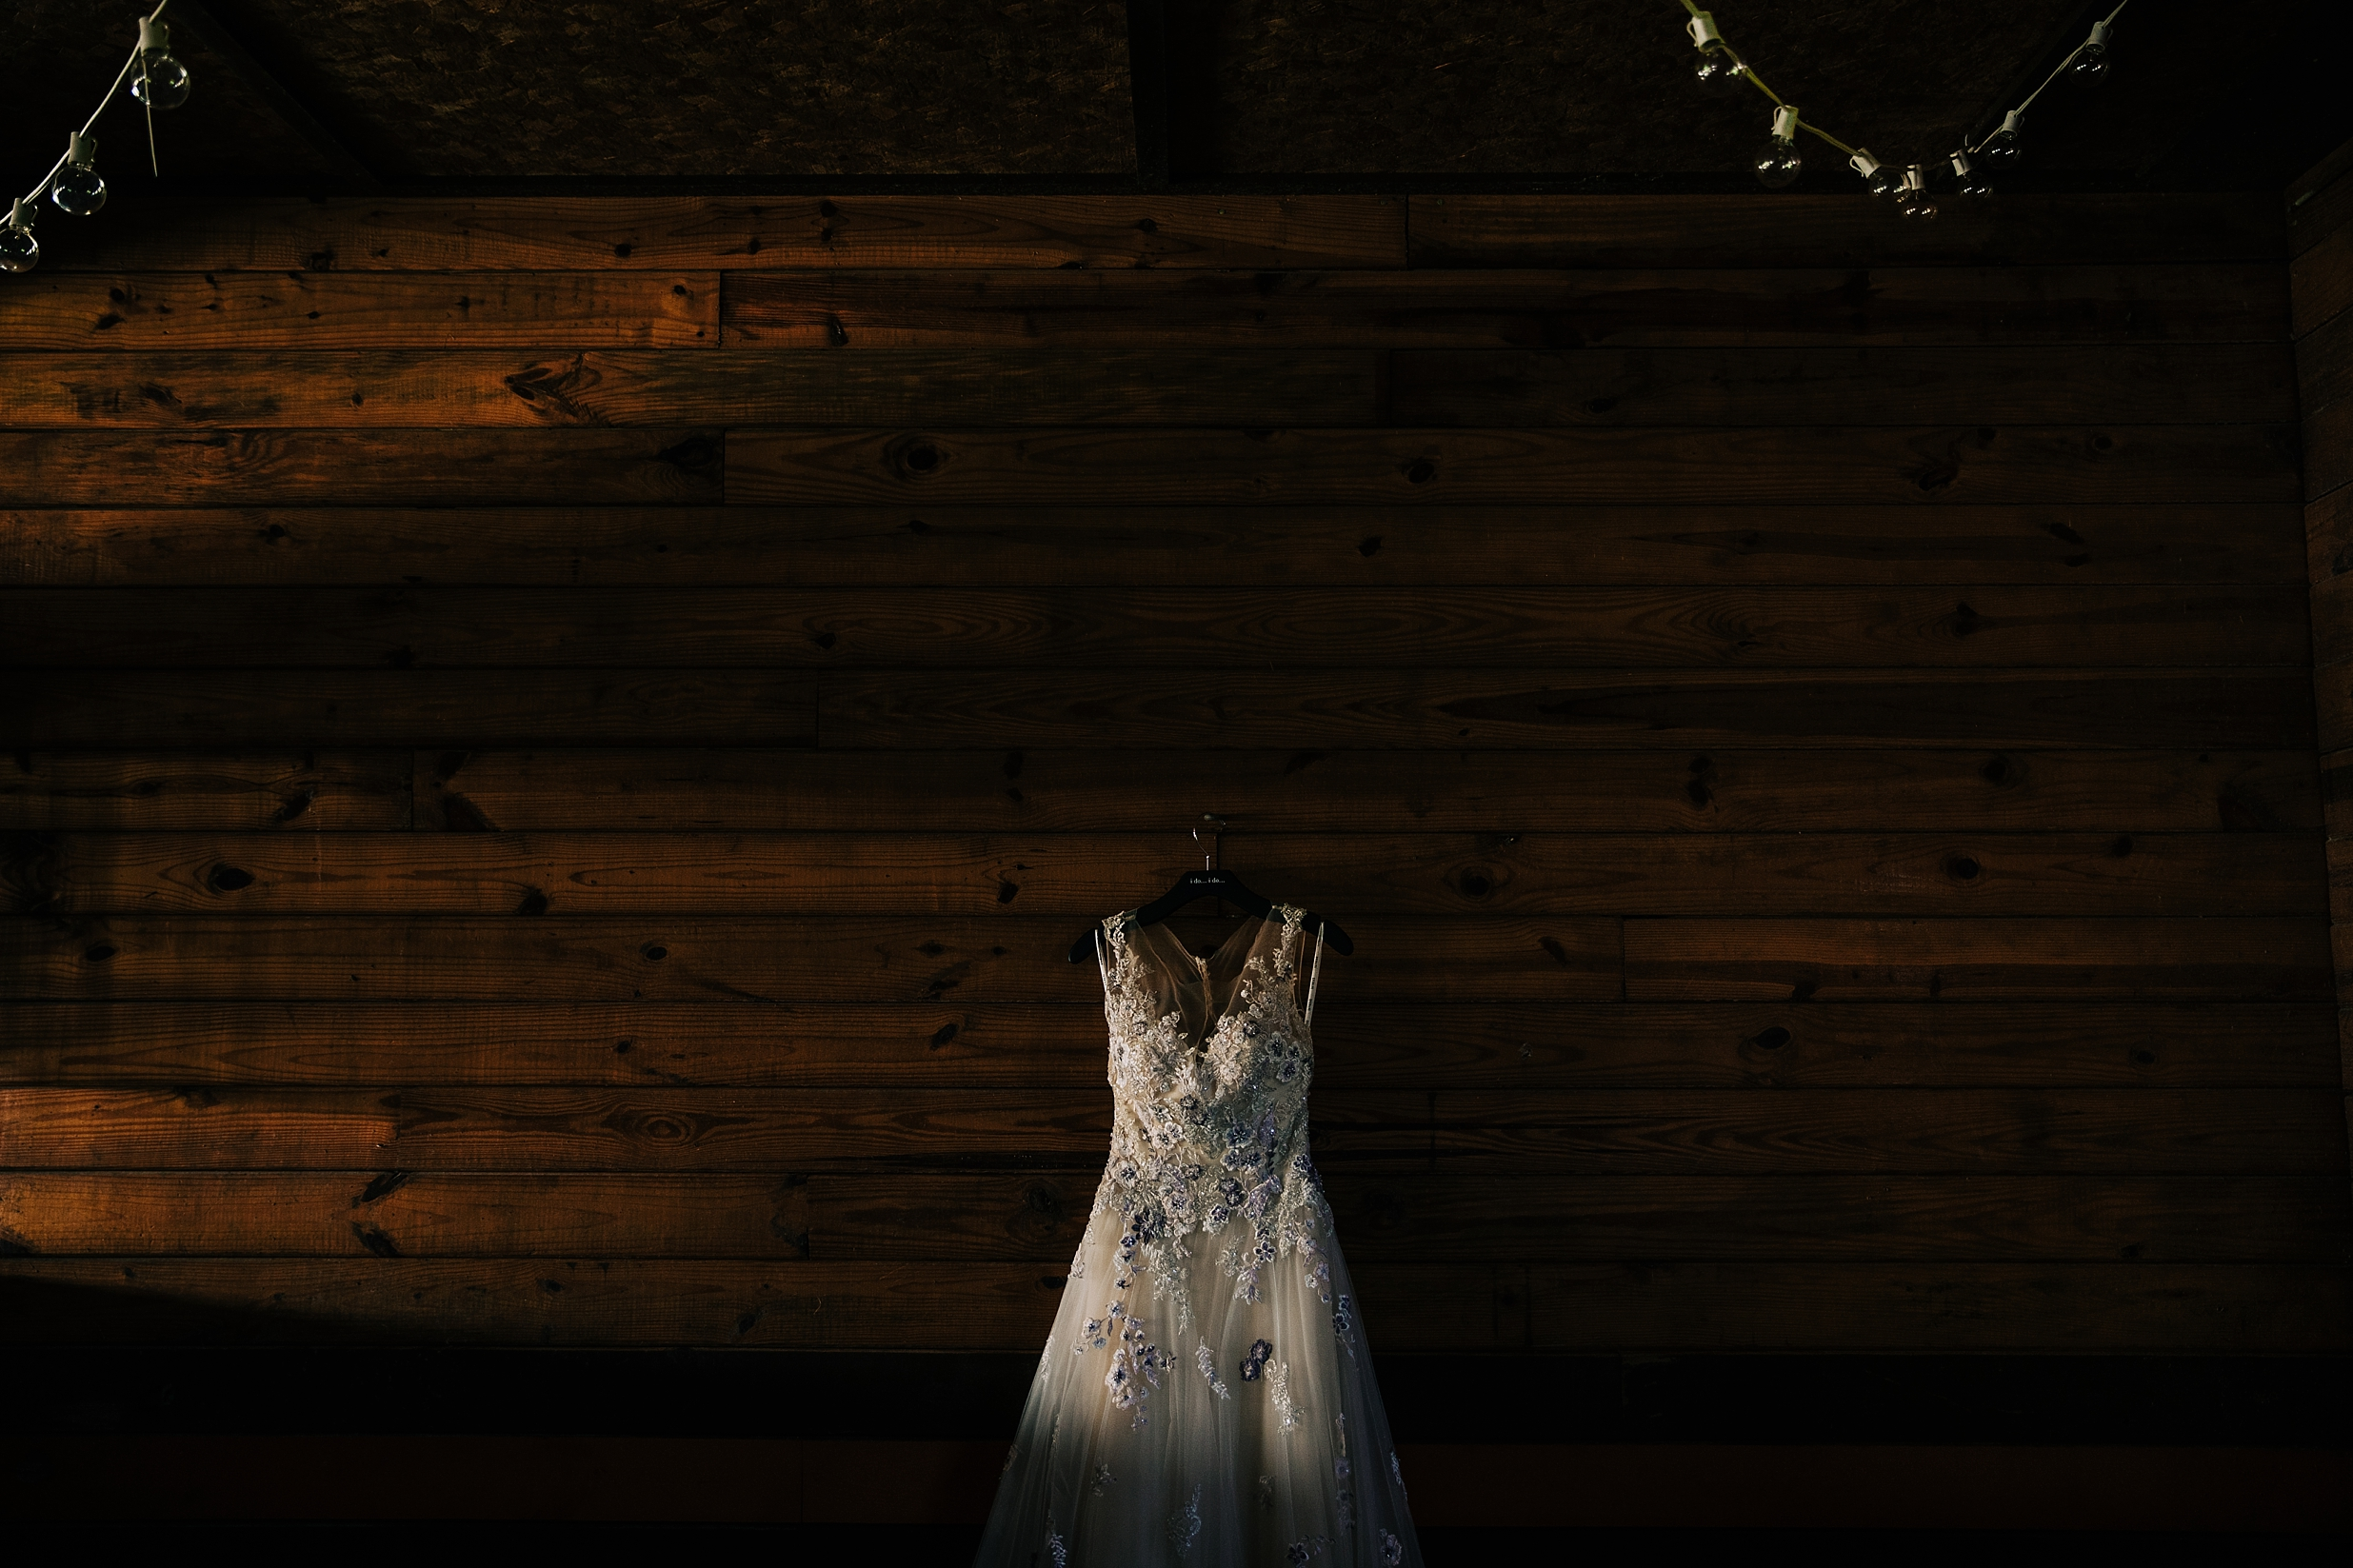 historic-upstate-ny-wedding-church-backyard-photographer_0001.jpg